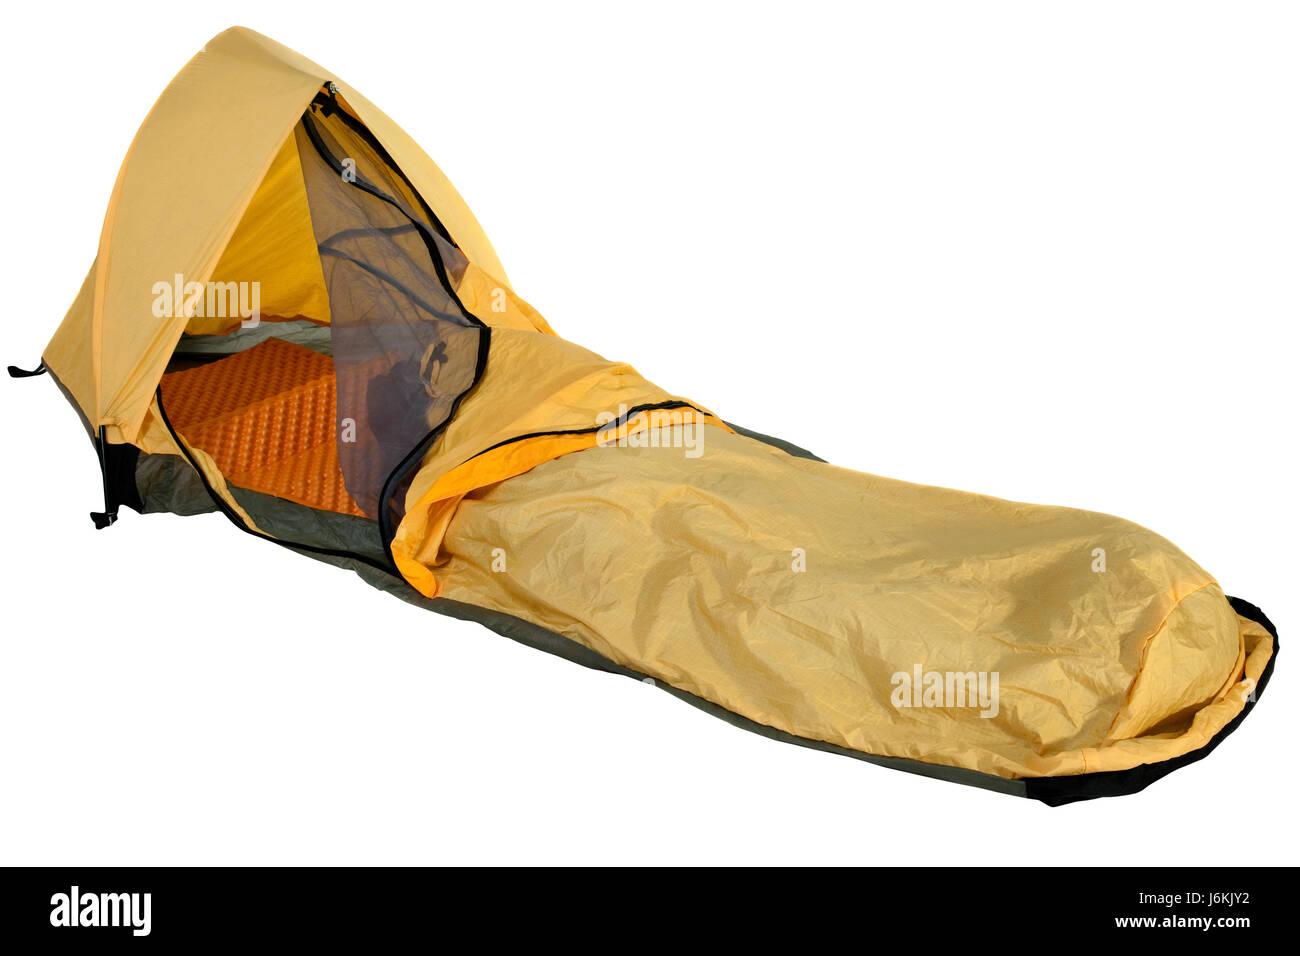 c&ing solo tent expedition sack foam horizontal sleep sleeping c&ing hiking  sc 1 st  Alamy & camping solo tent expedition sack foam horizontal sleep sleeping ...